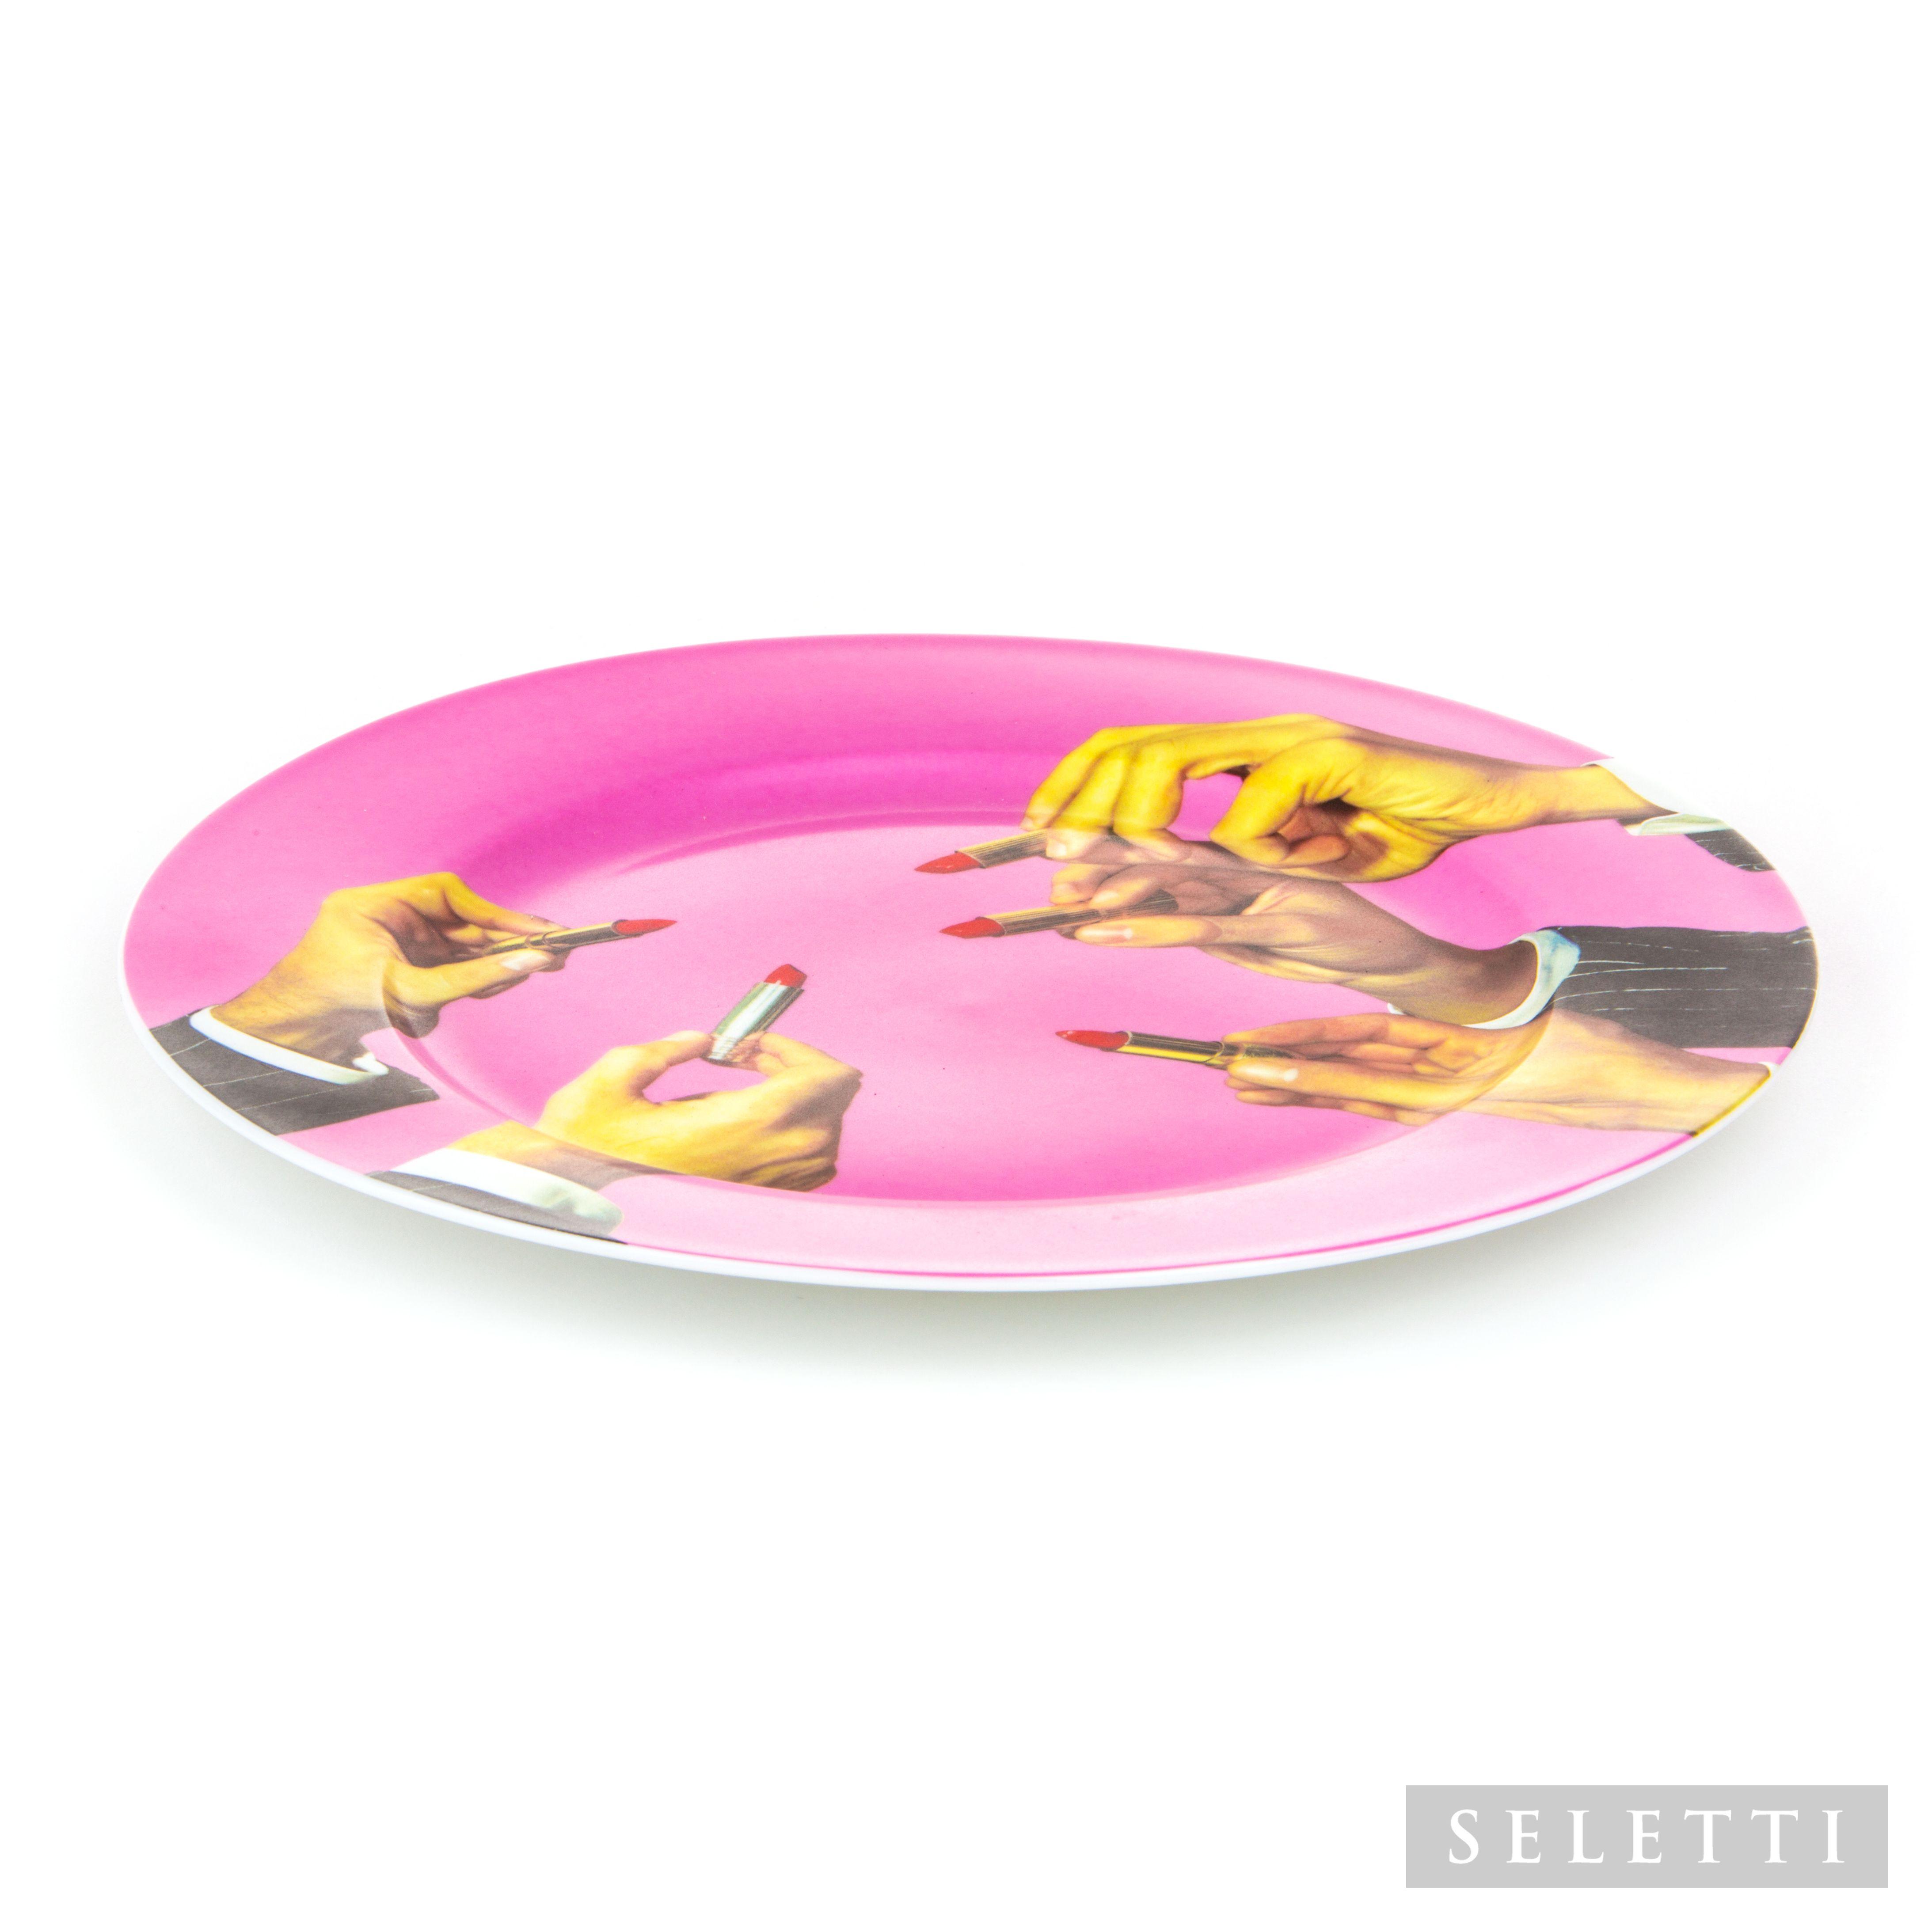 Lipstick Seletti | Dish | 16937LIPSTICKS